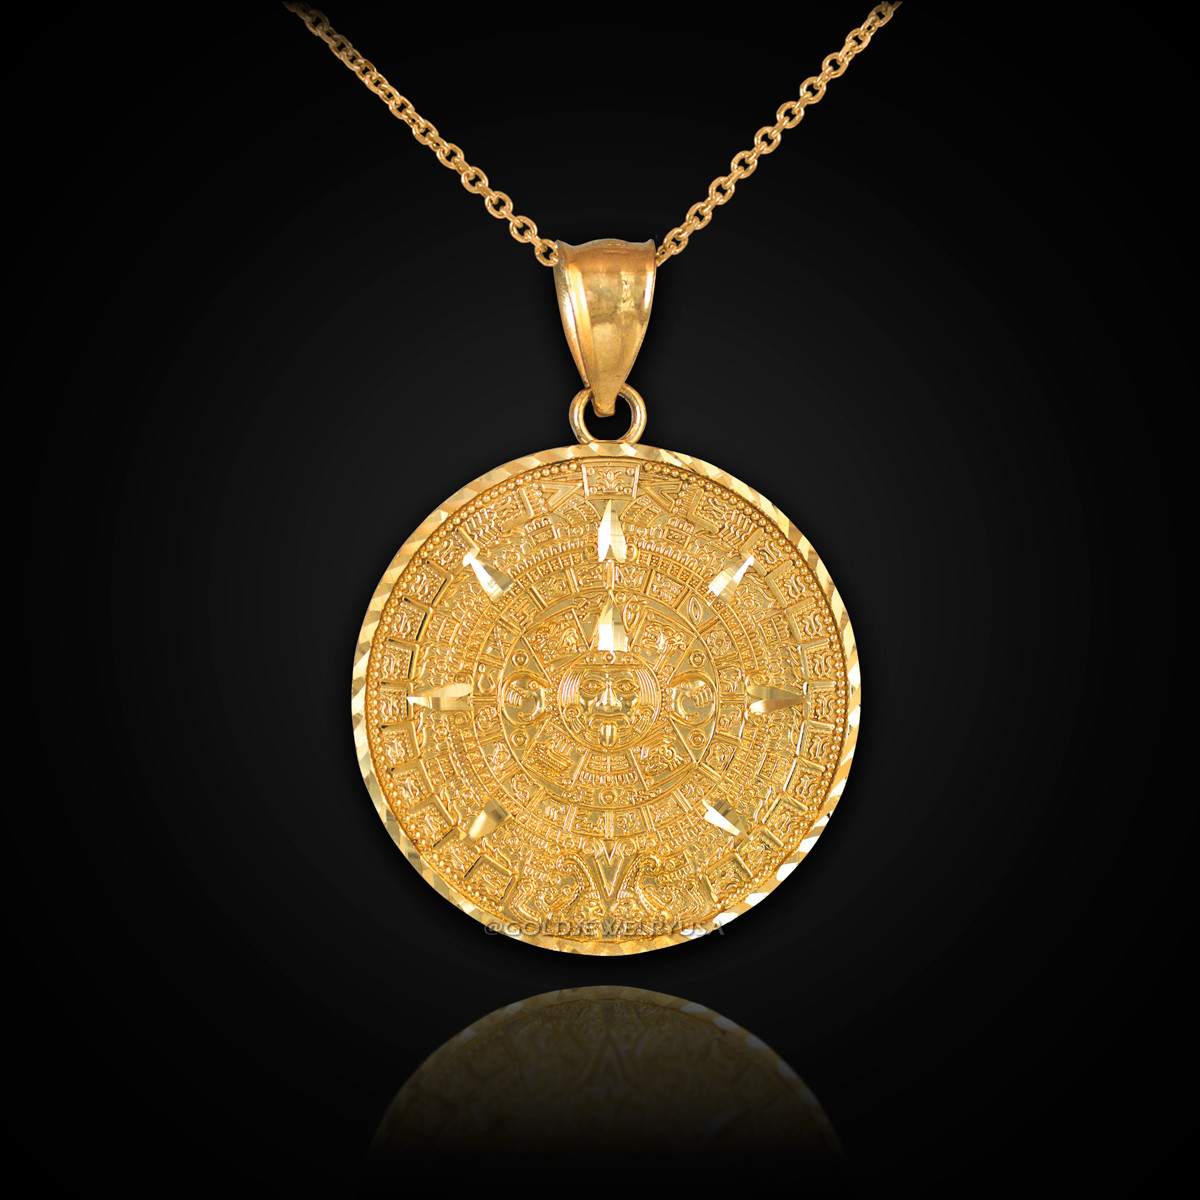 Gold aztec mayan sun calendar necklace gold aztec calendar necklace loading zoom aloadofball Image collections